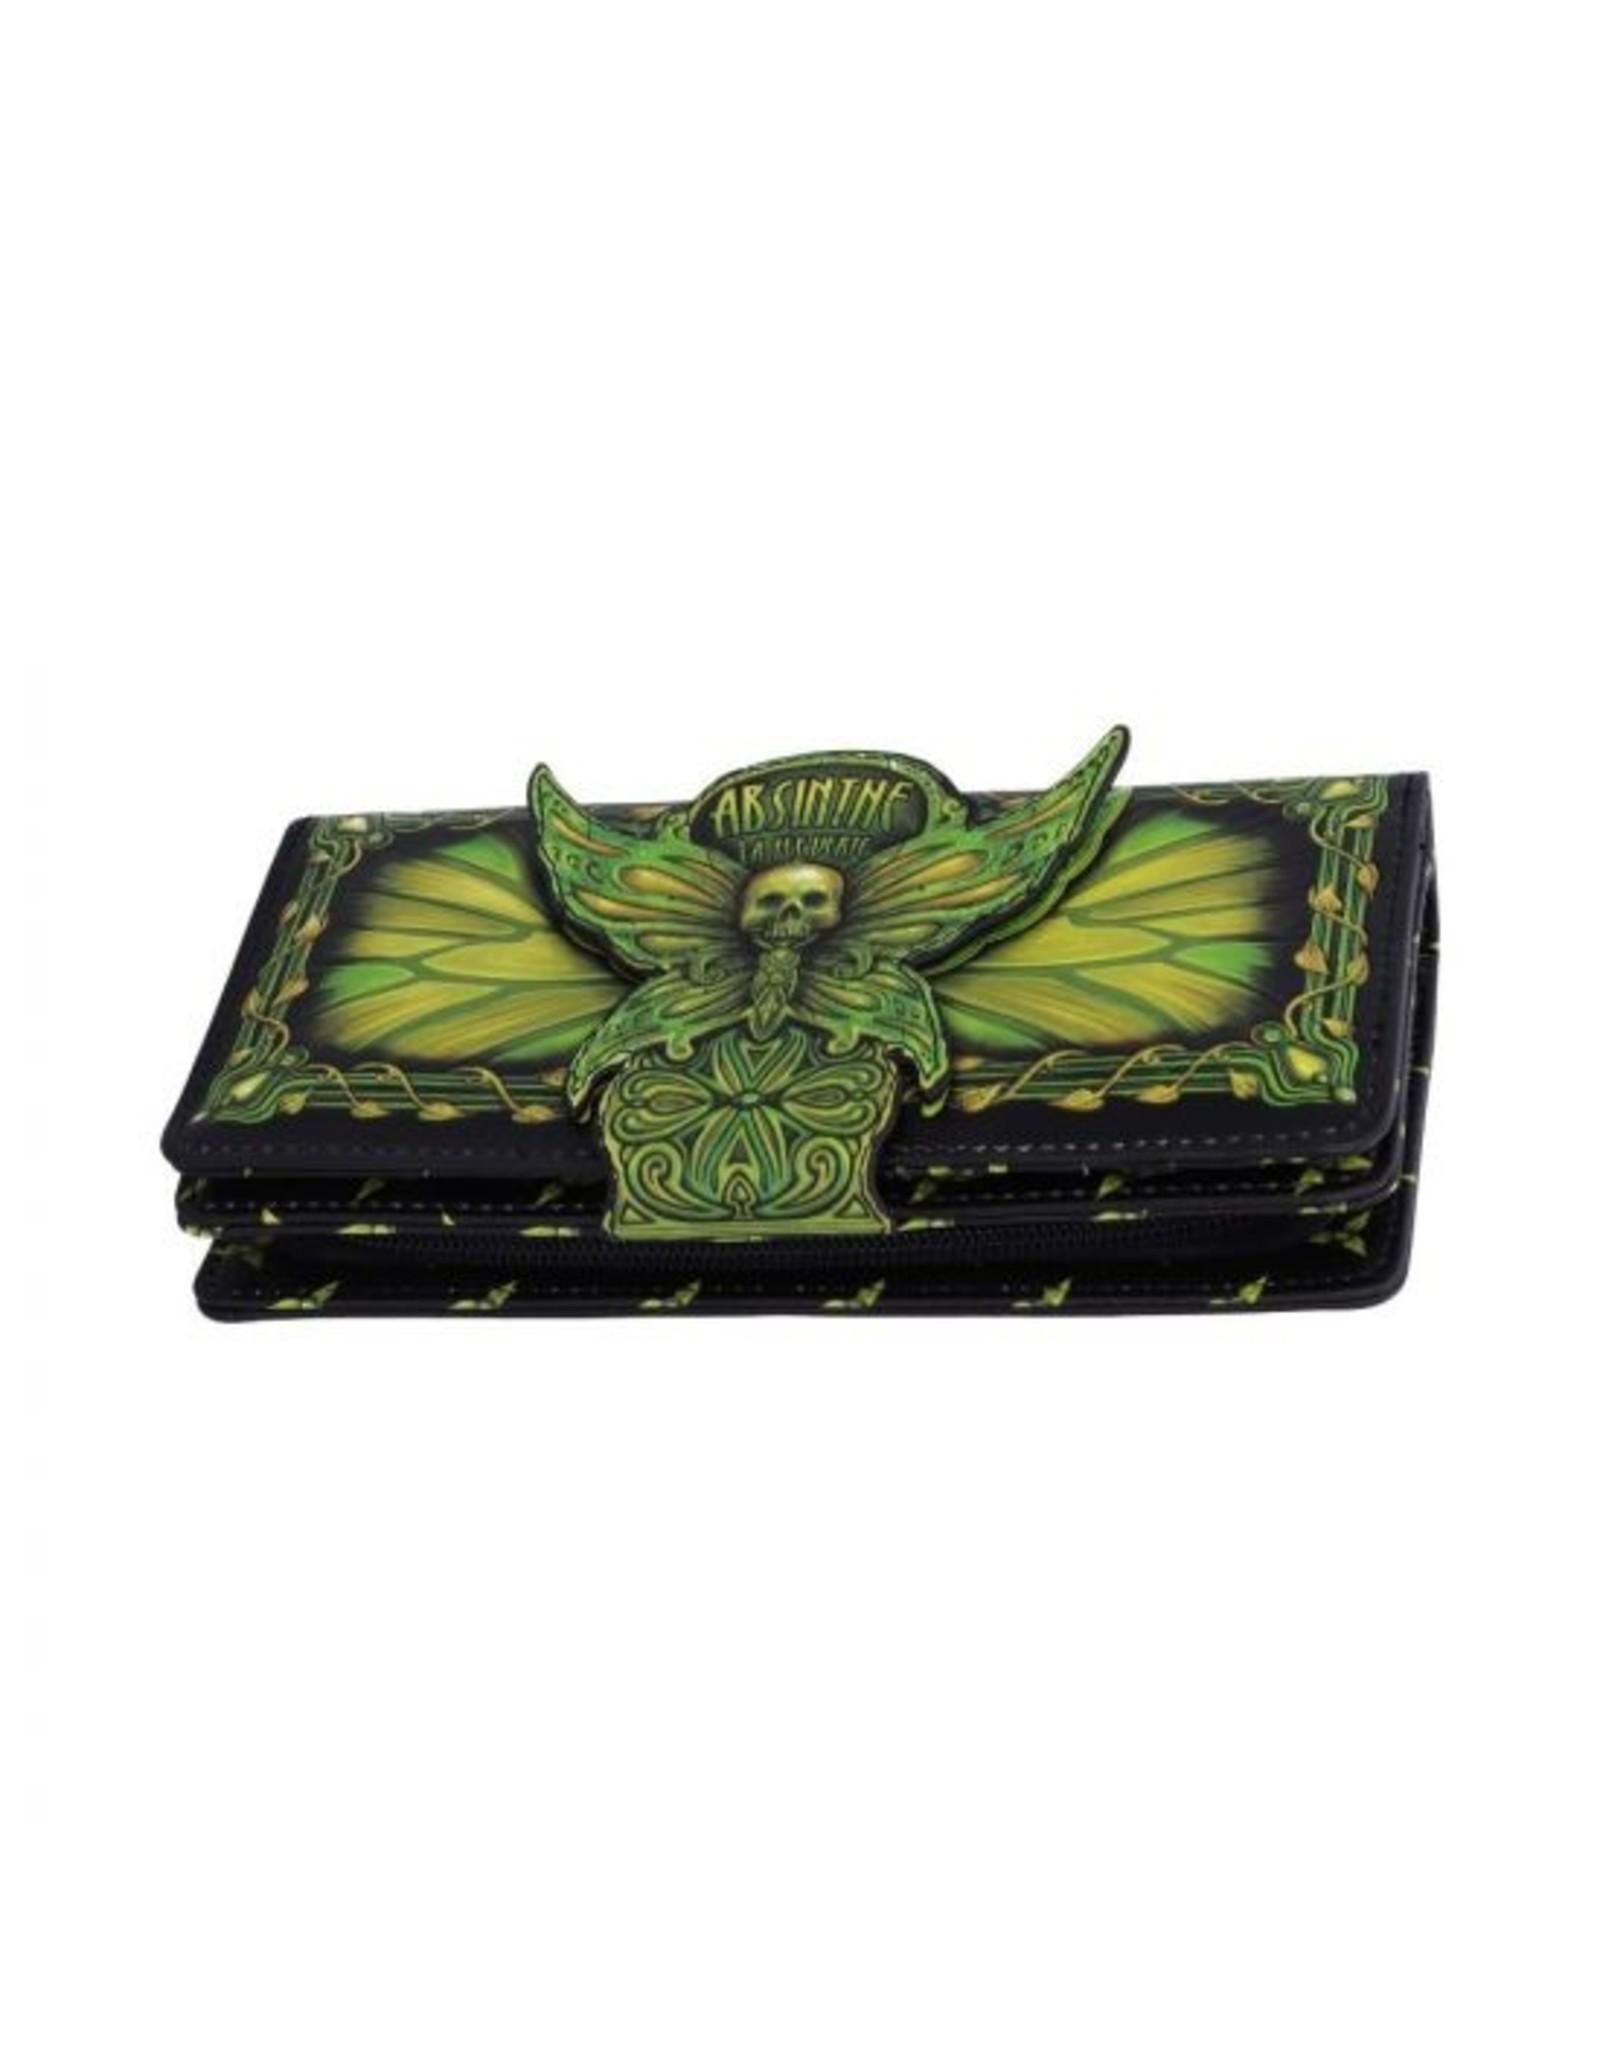 Geldbörse Absinthe - La Fee Verte